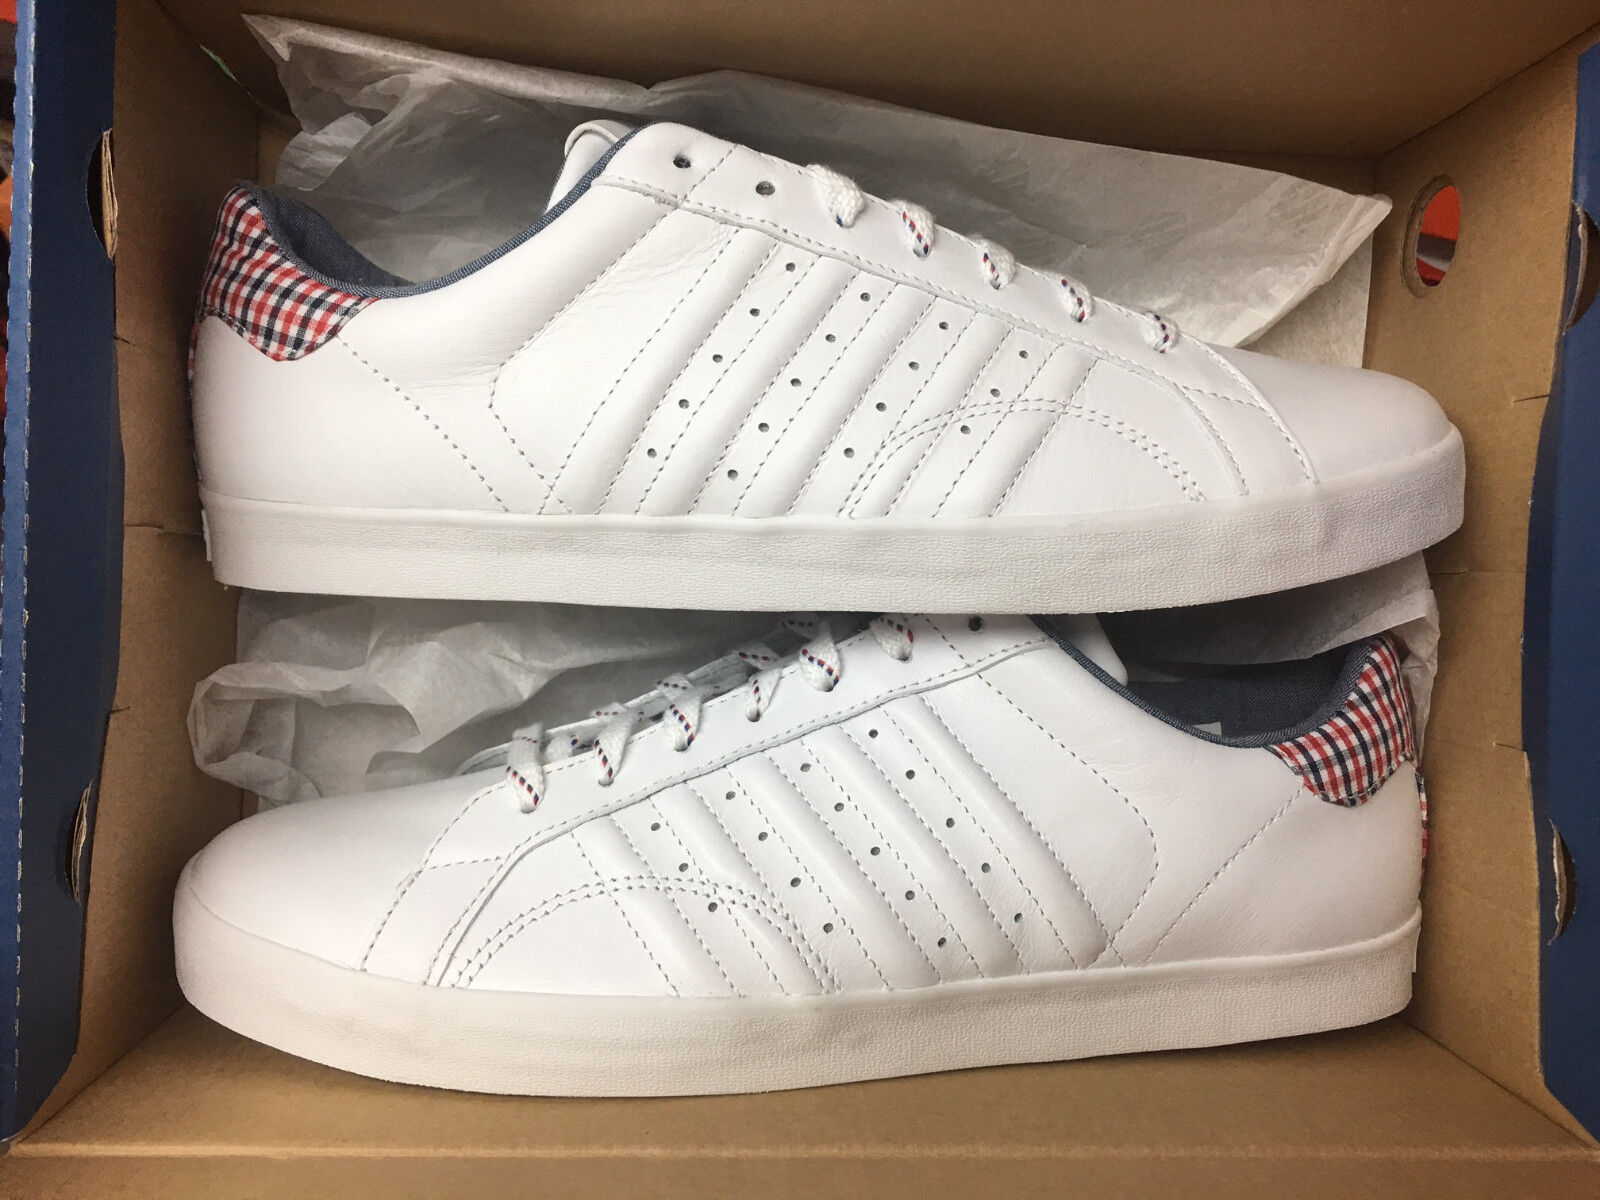 K-Swiss Belmont Plaid Neu Gr:44,5 White Schuhe 03447-161M Sneaker Leder Weiß Schuhe White ddb177